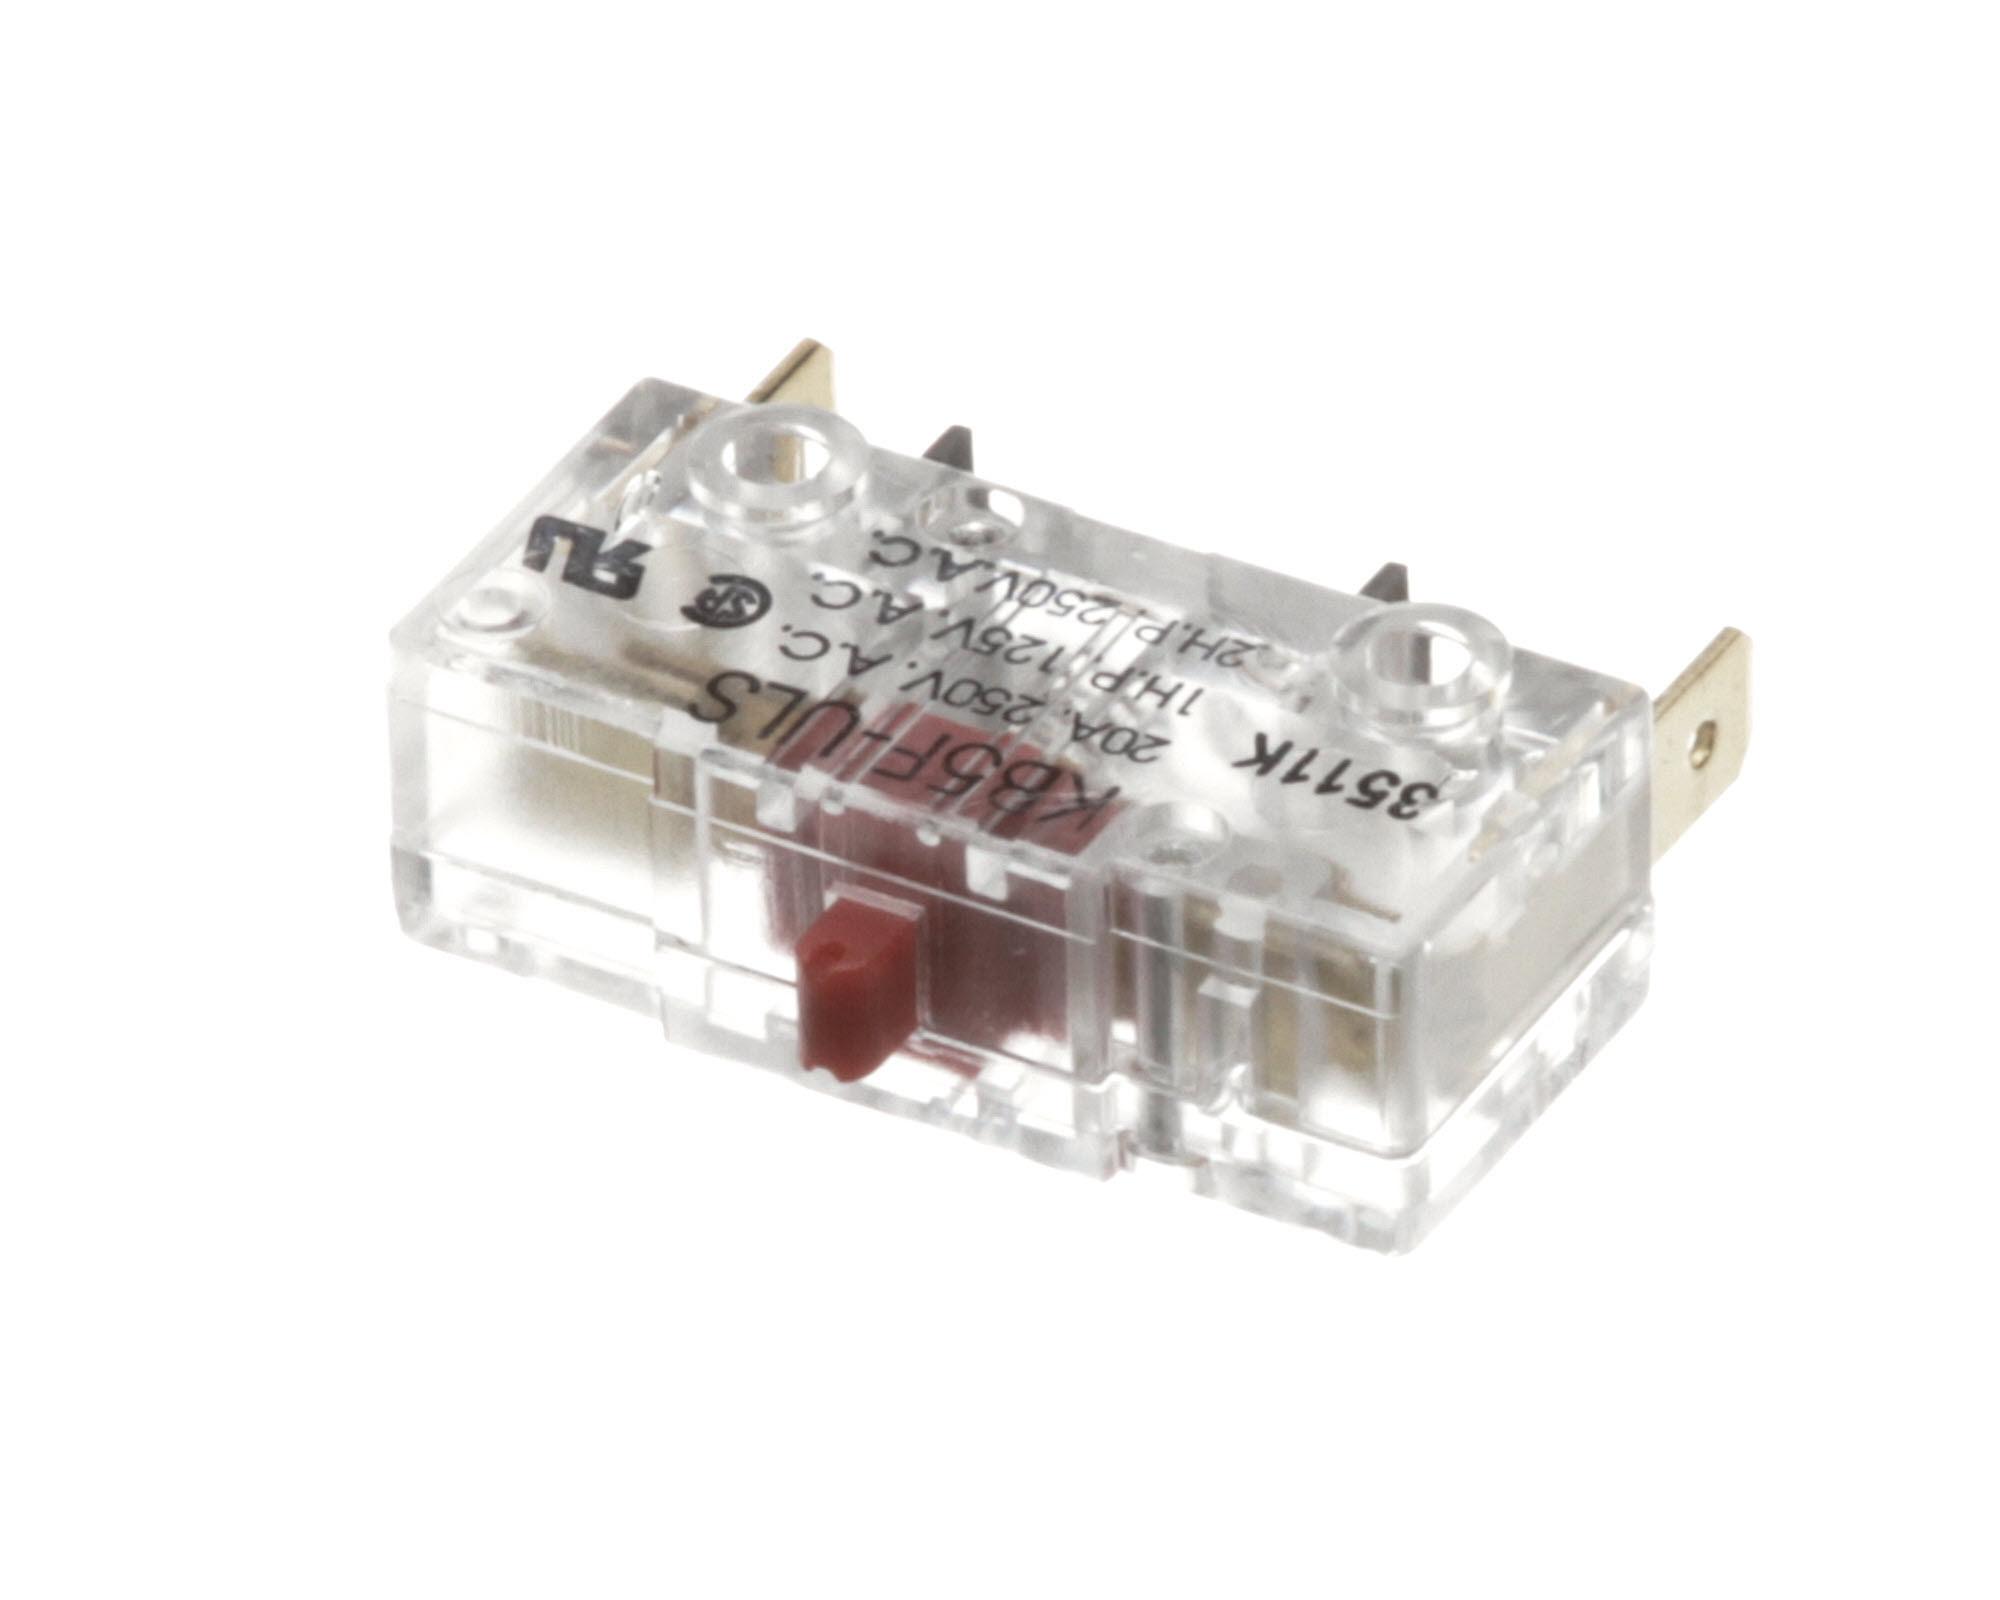 Rondo 9371 Limit Switch Kb5F-Uls